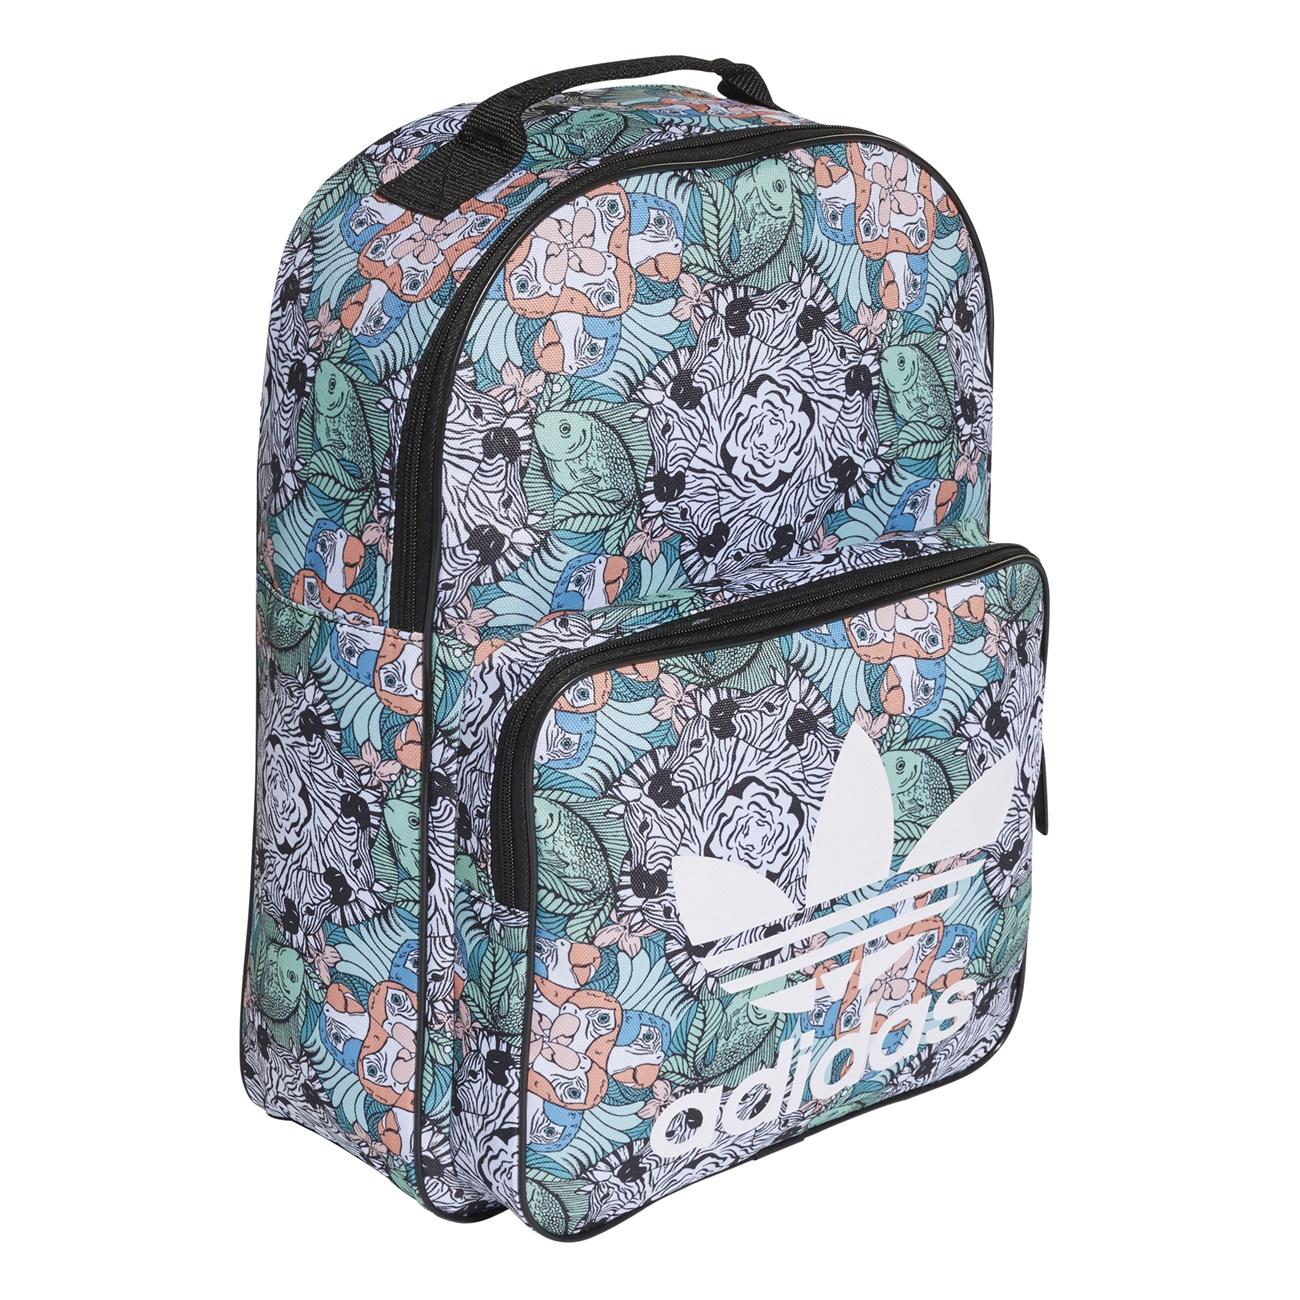 0d3ad83823d1a Adidas Originals Classic Backpack Animal Girl (Multicolor)